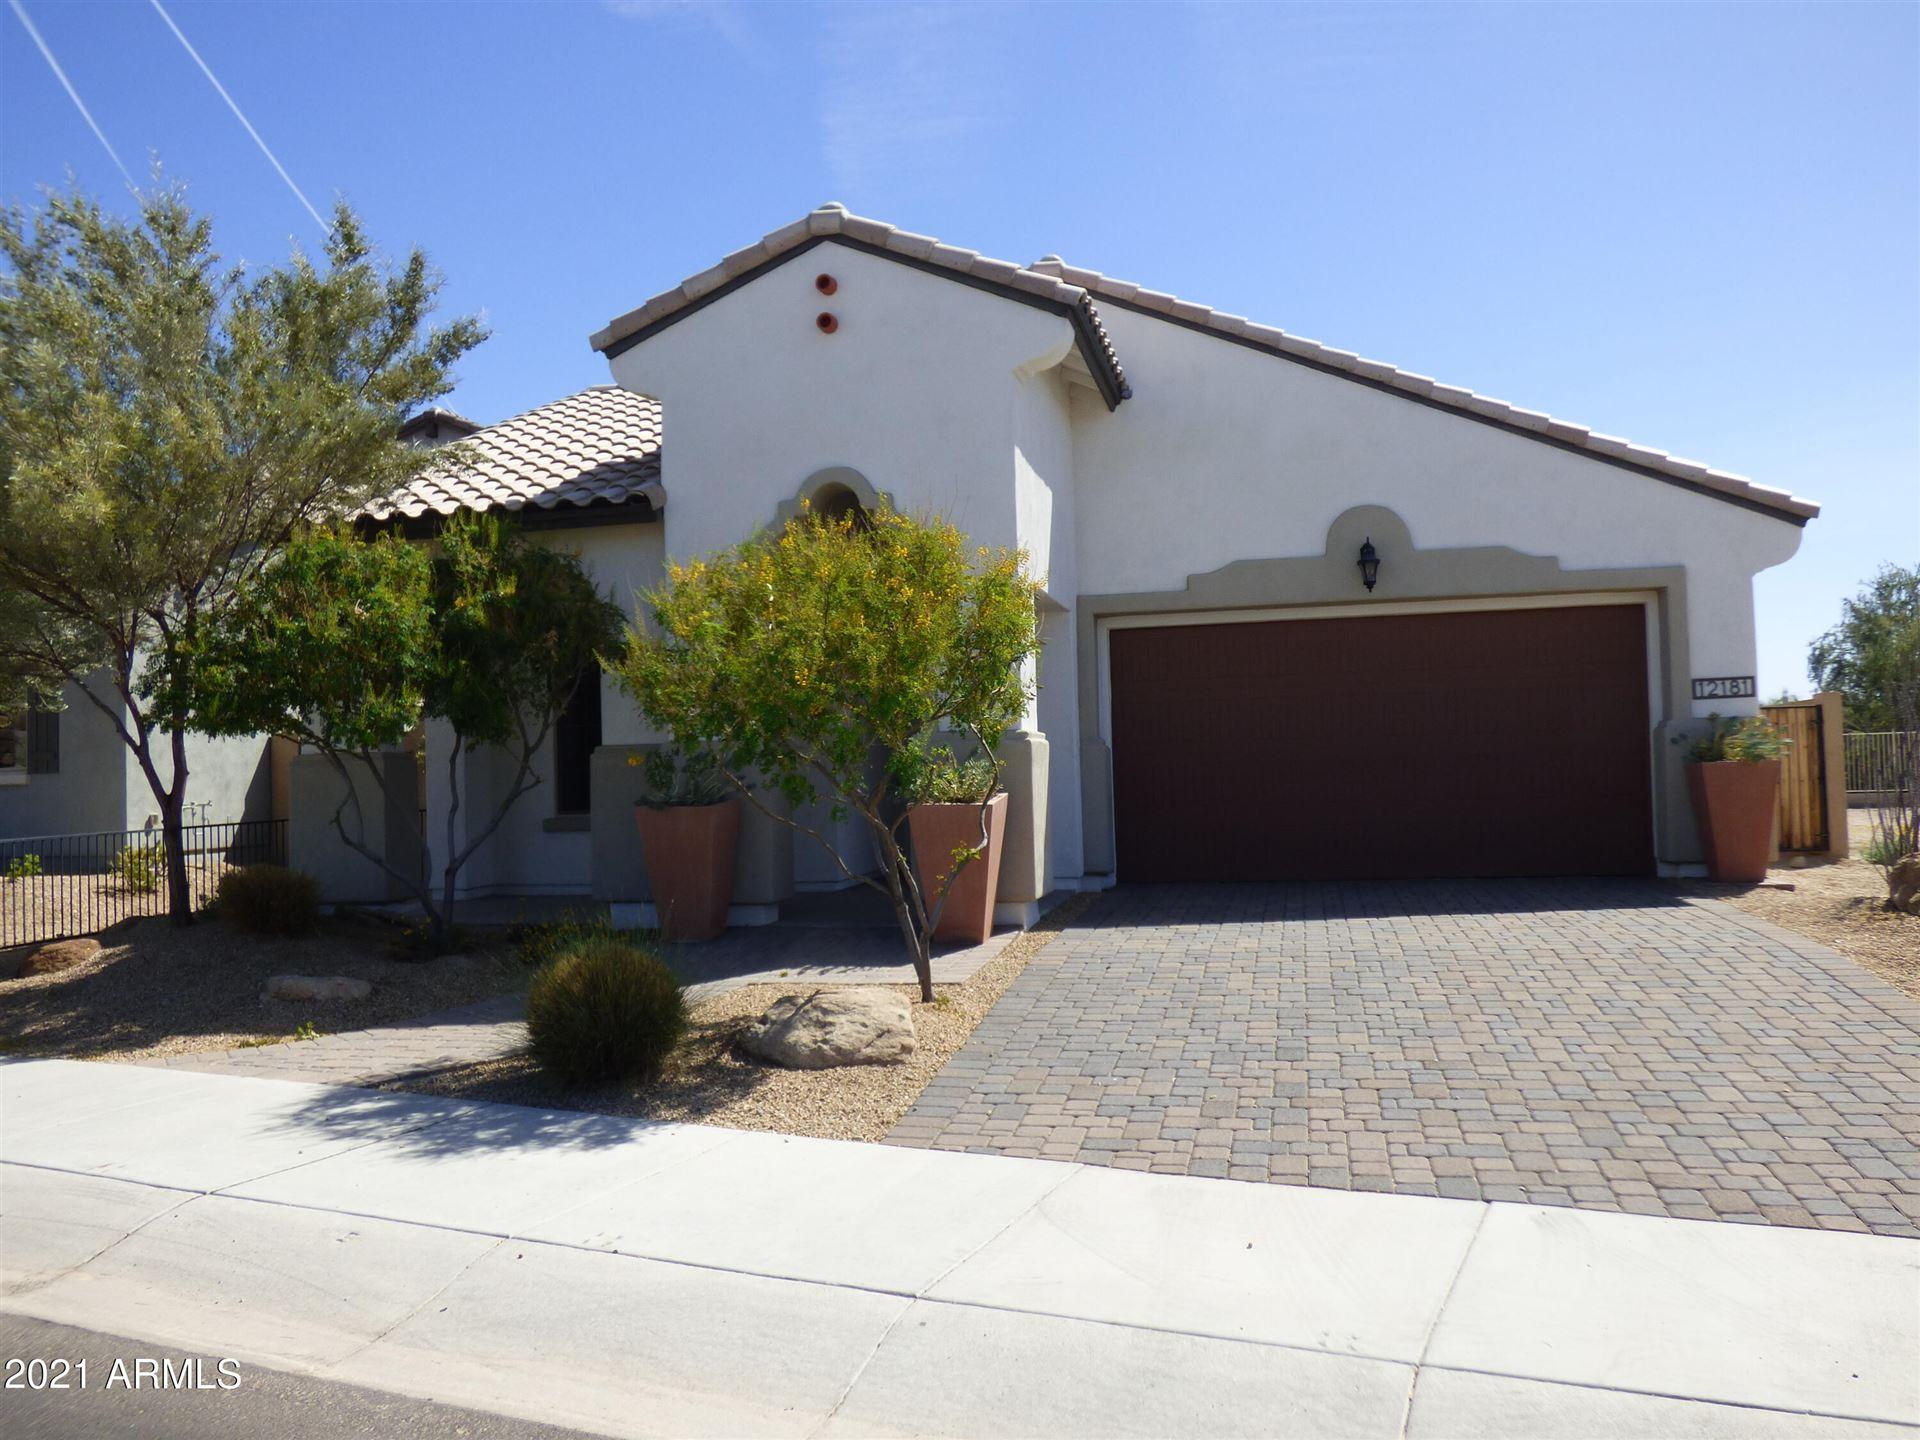 Photo of 12181 S 184th Avenue, Goodyear, AZ 85338 (MLS # 6296177)